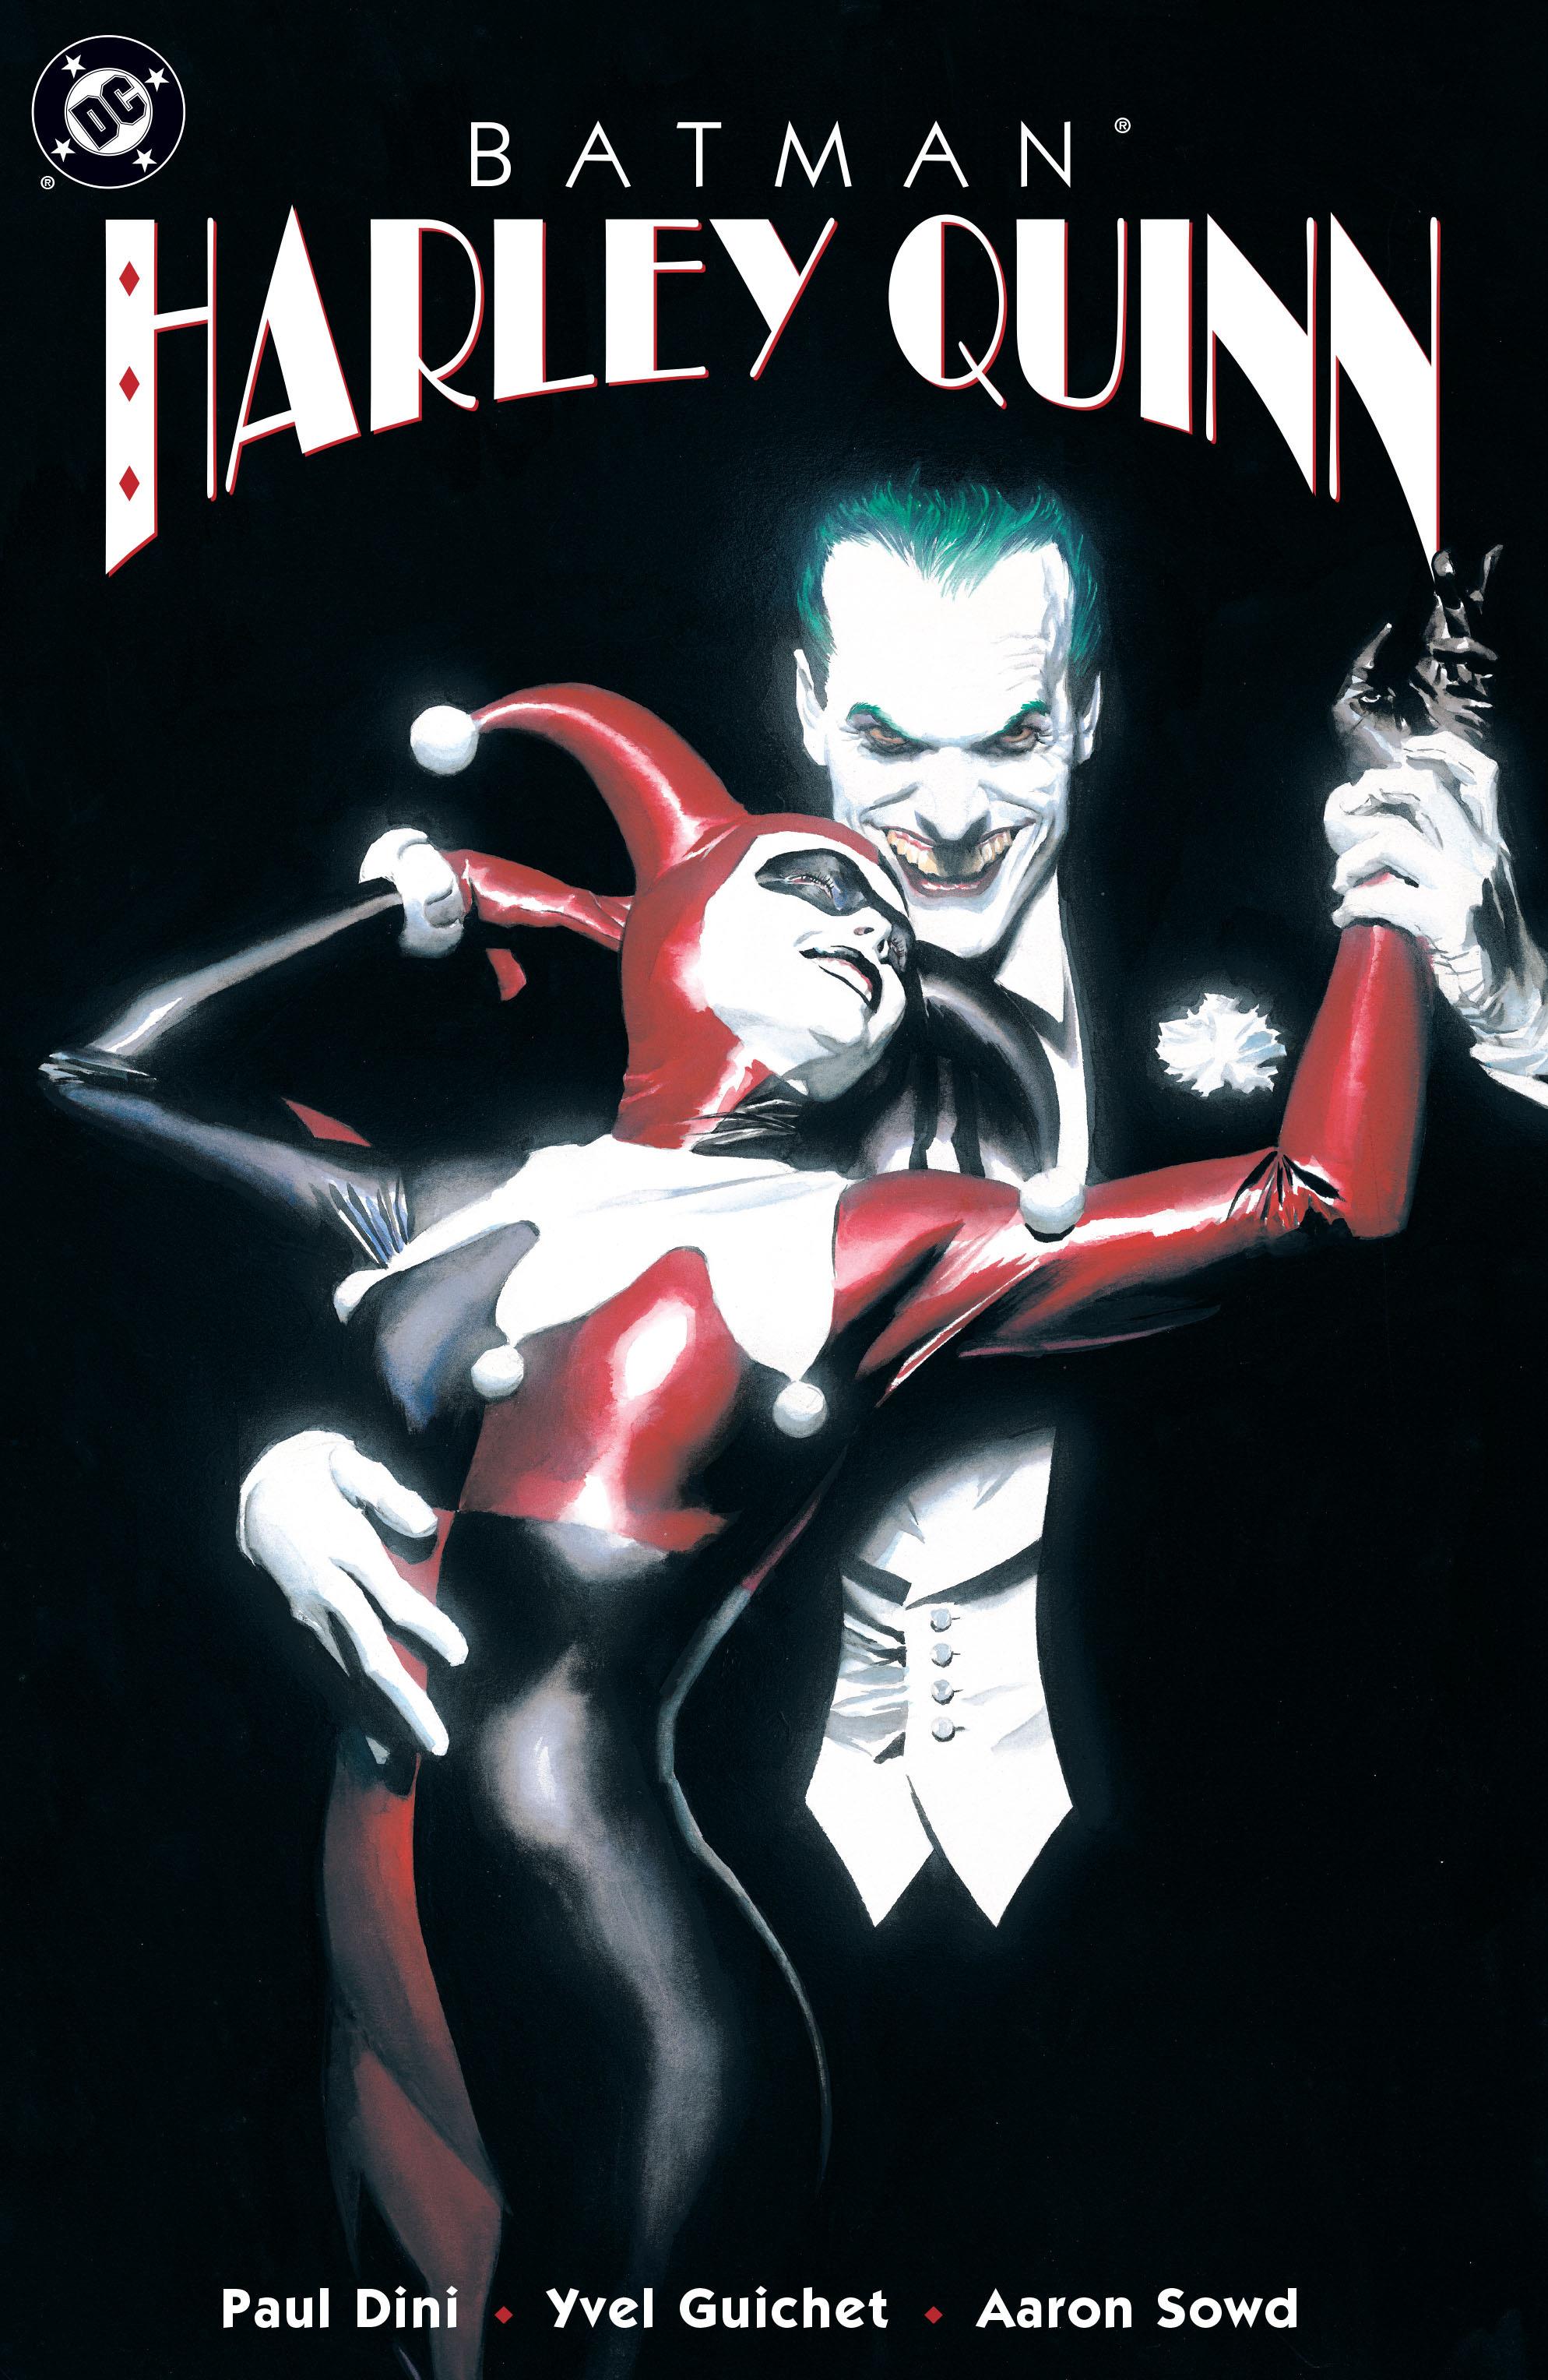 Batman: Harley Quinn Full Page 1